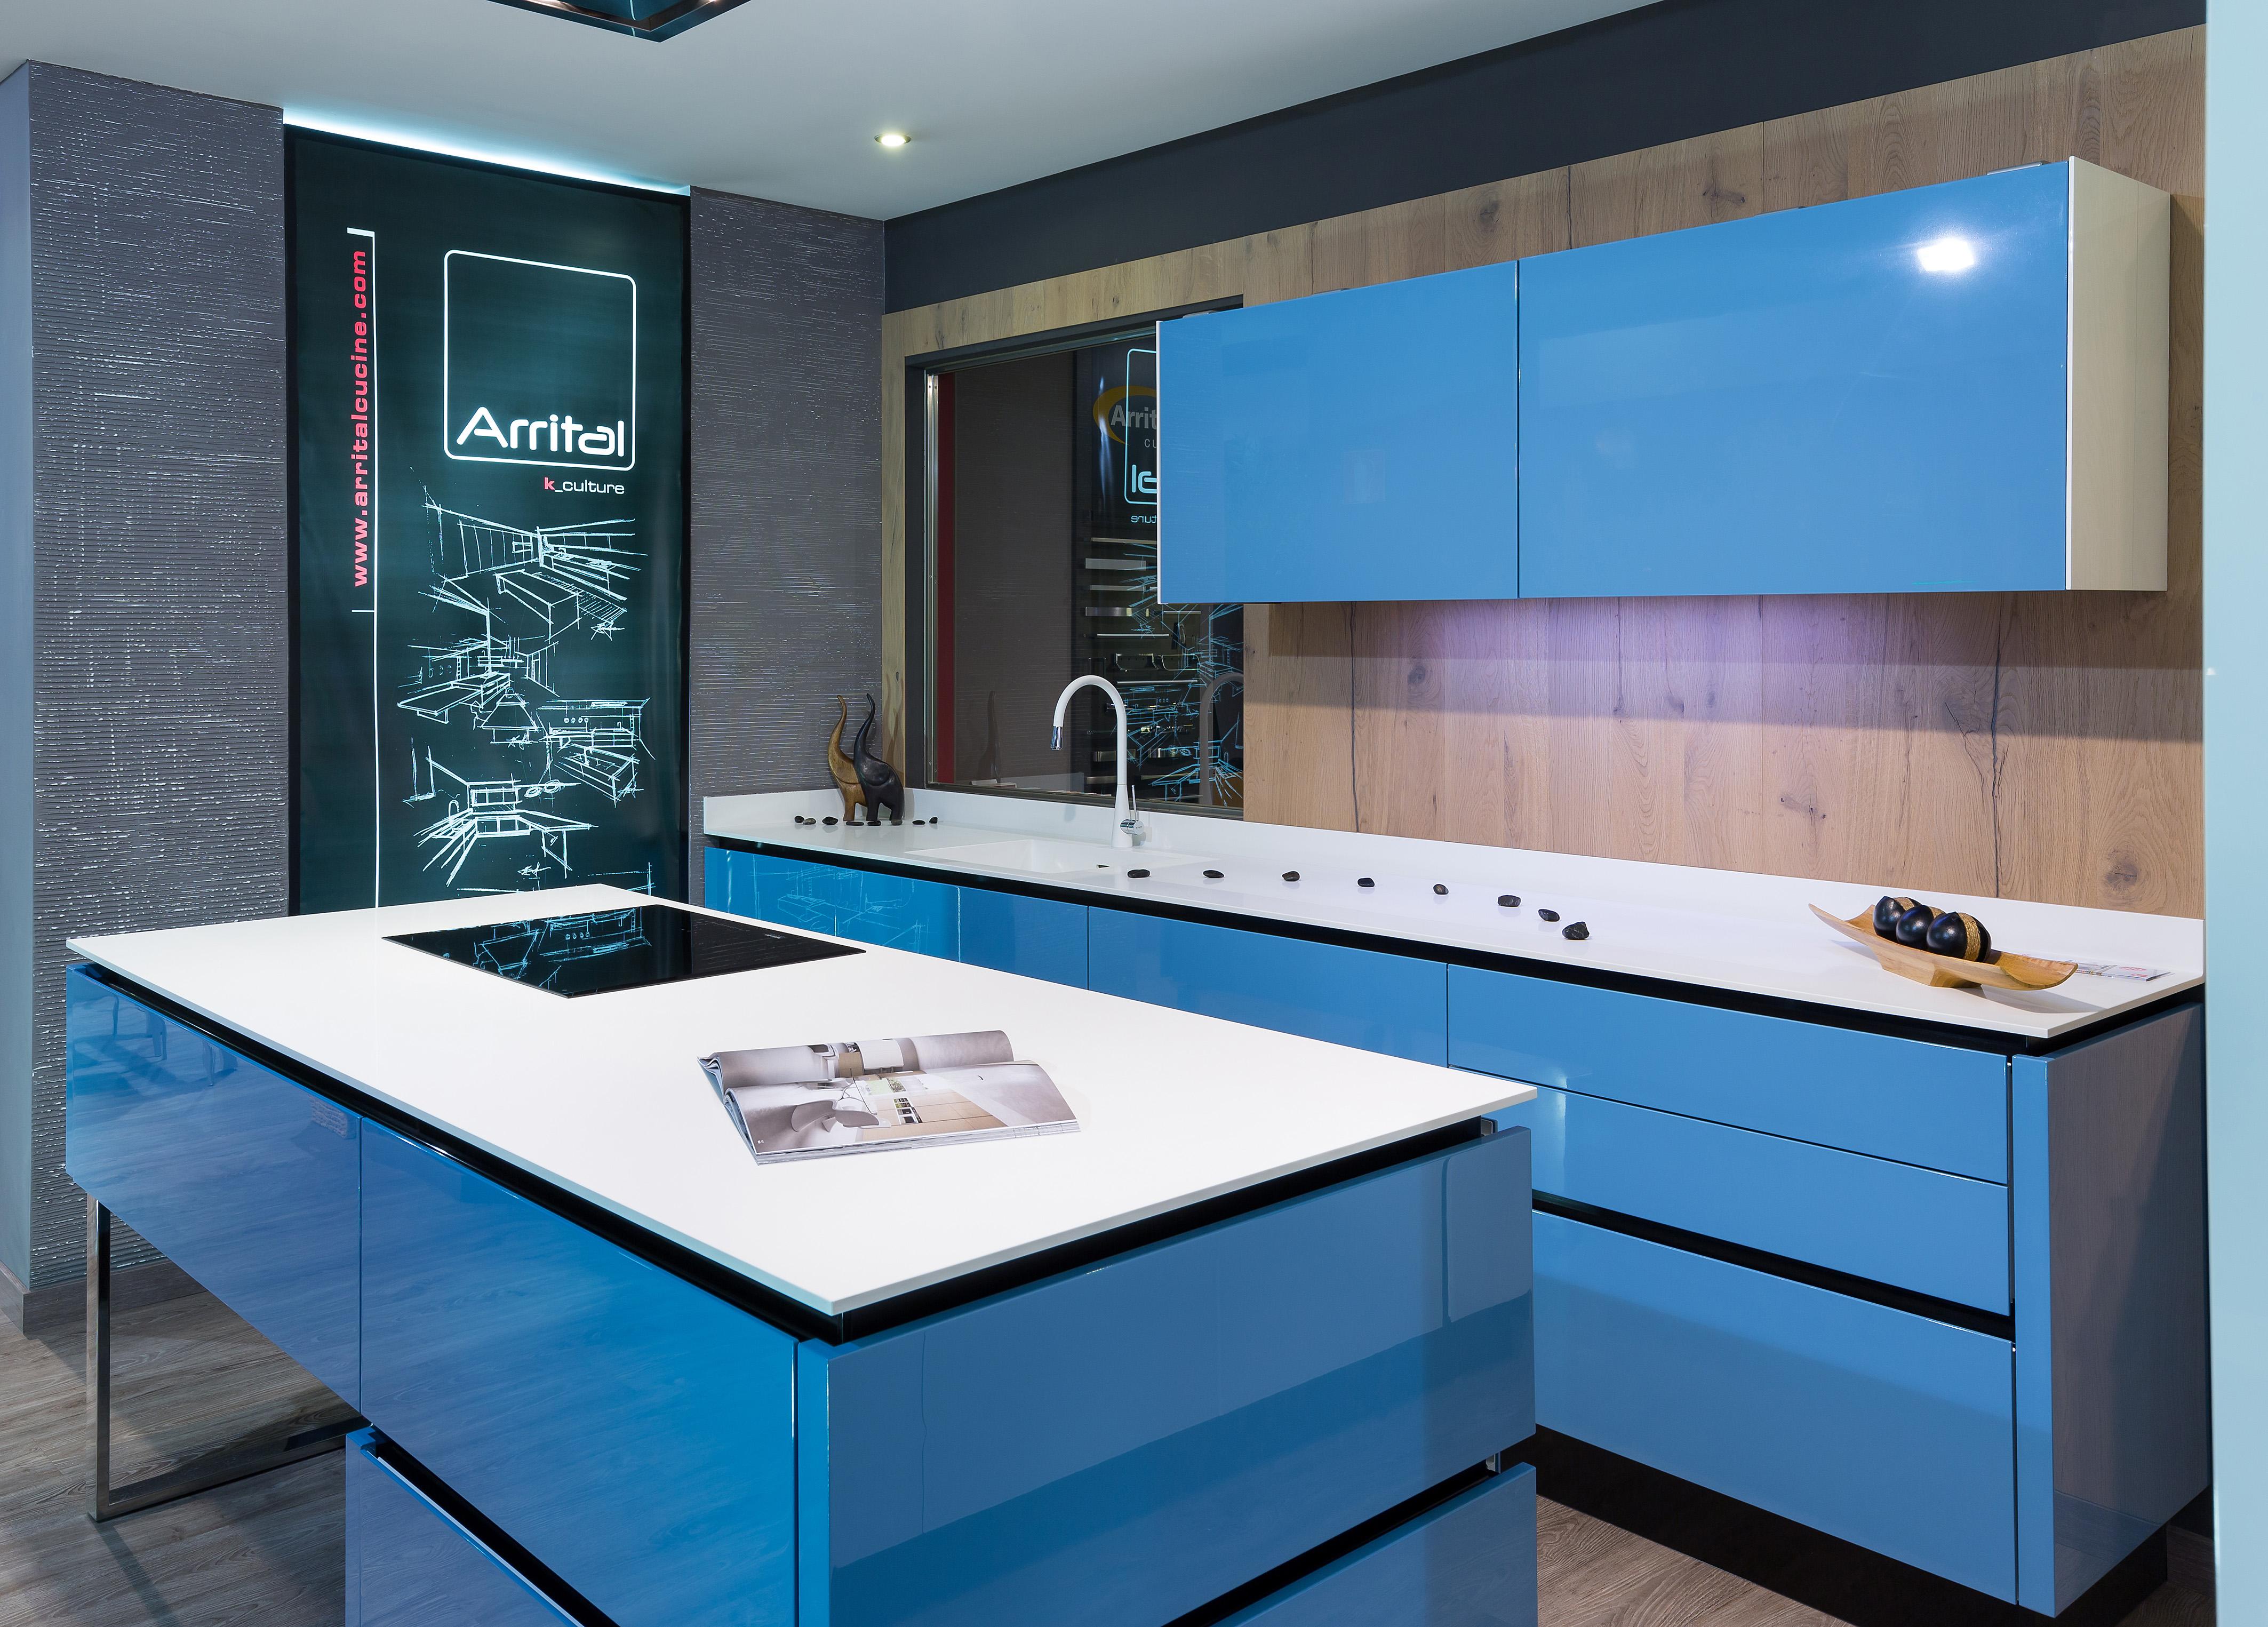 Genial exposicion cocinas madrid fotos cocinas rio for Cocinas modernas madrid